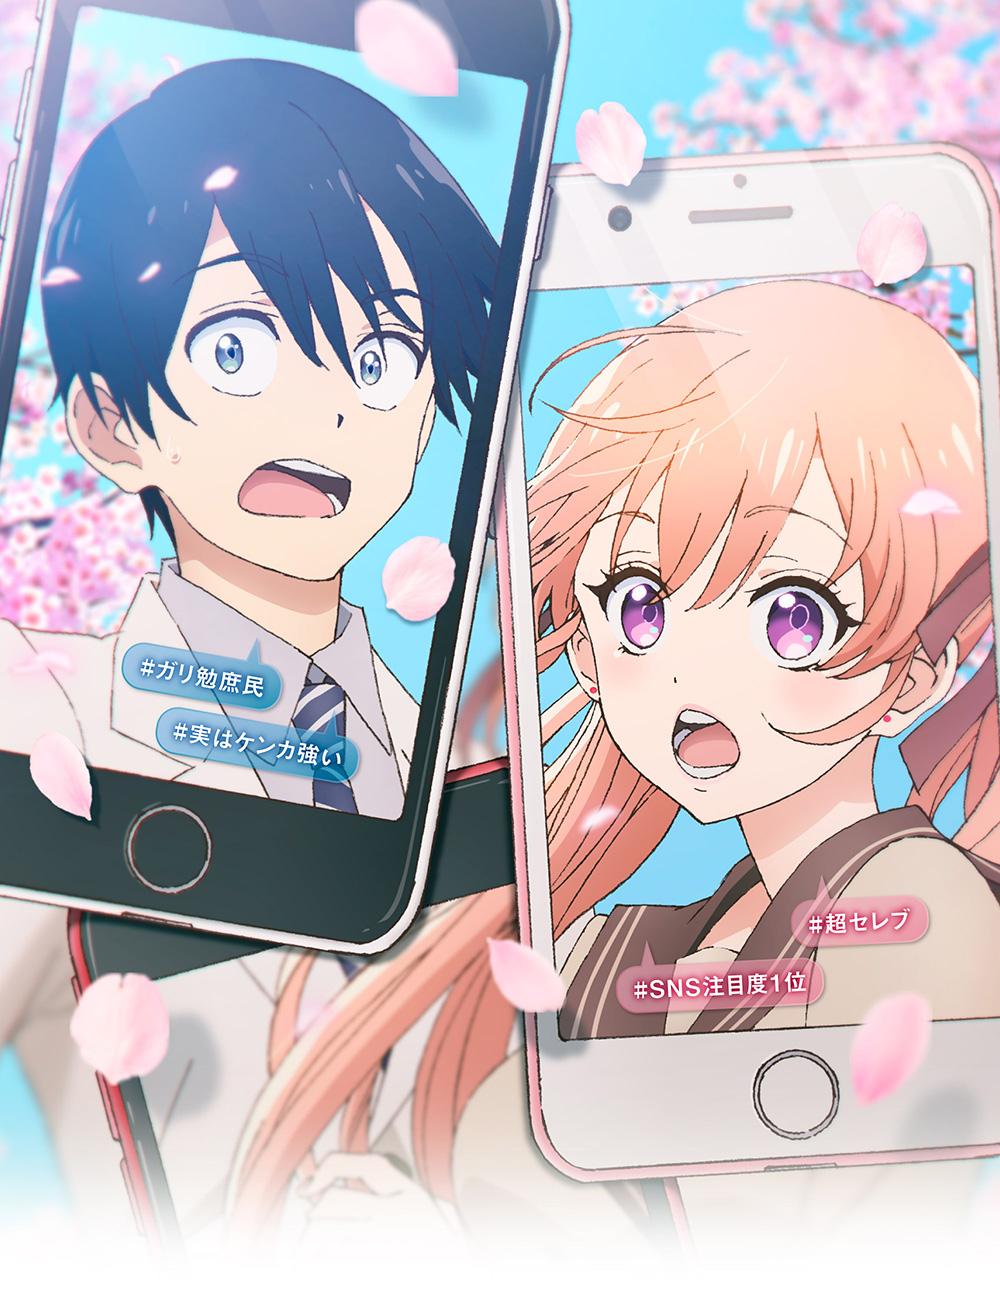 Kakkou-no-Iinazuke-Anime-Visual